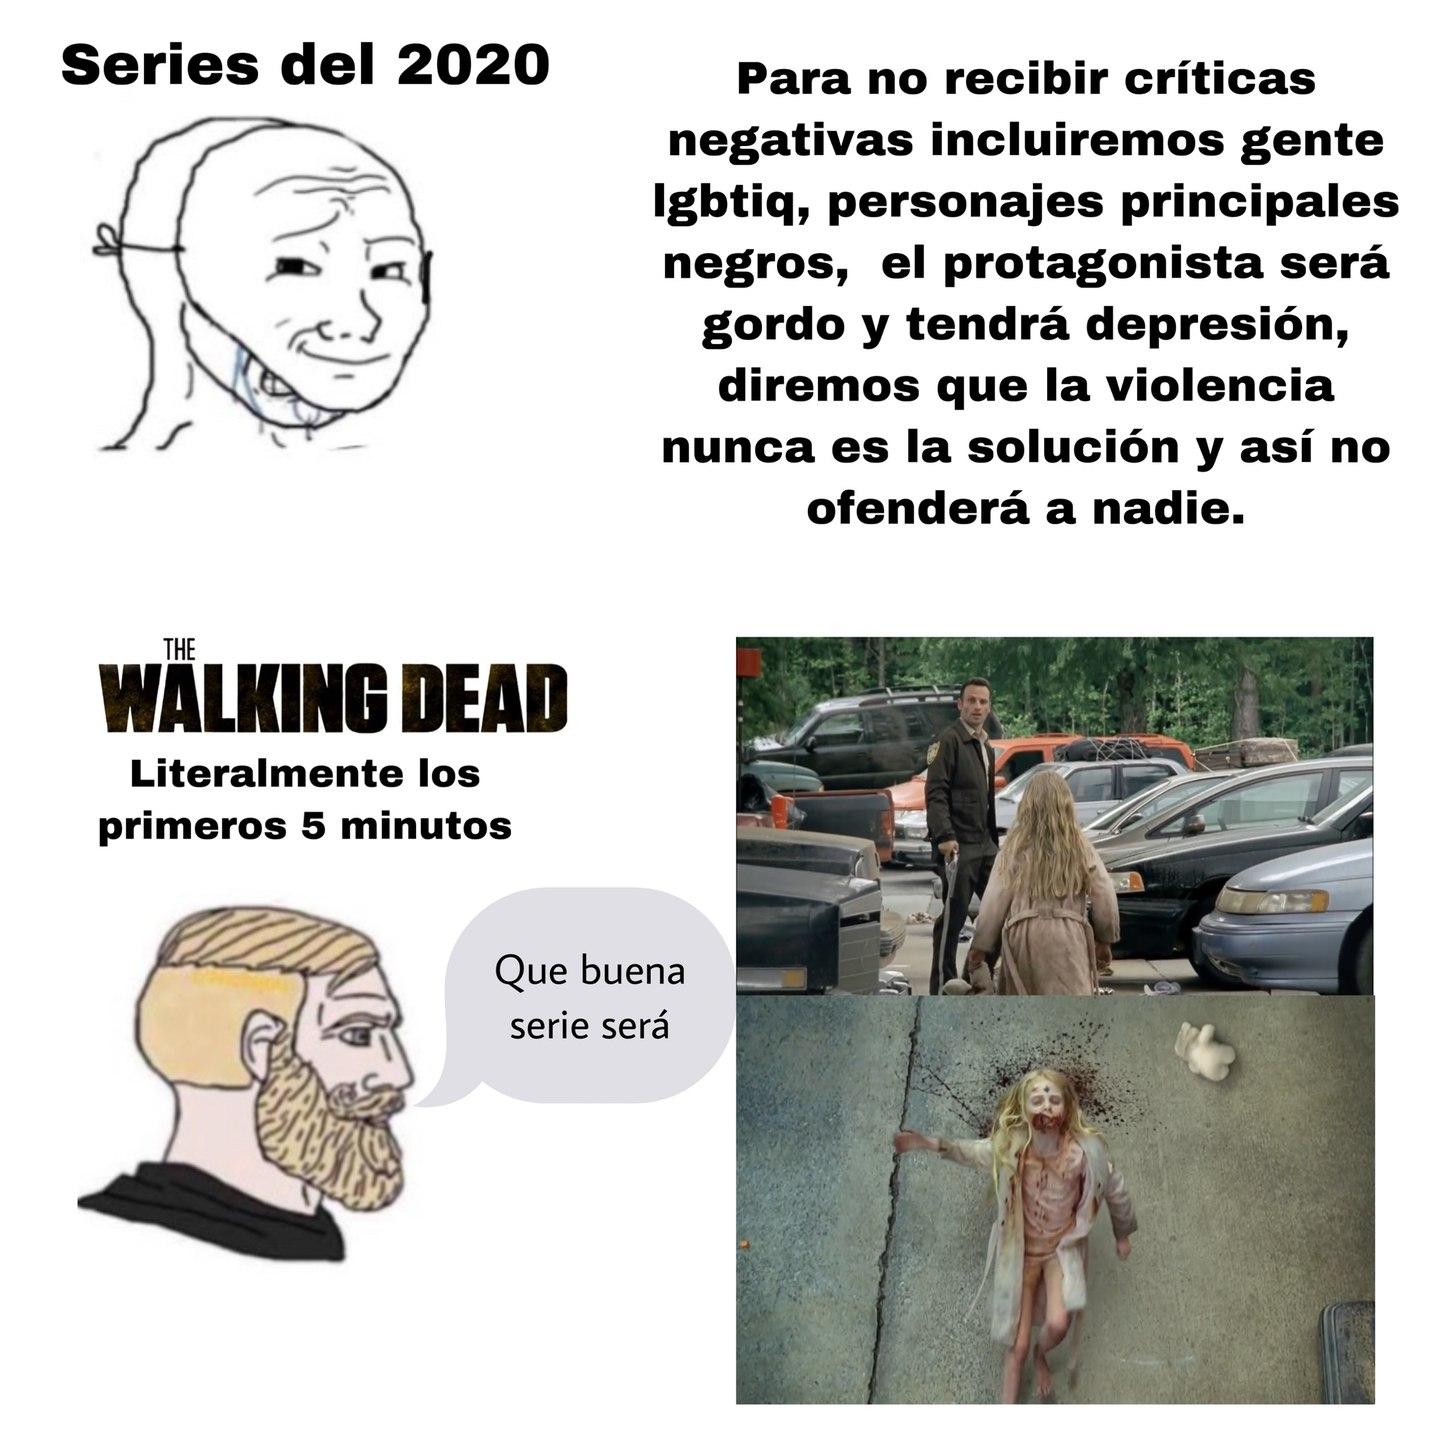 Re casual ir matando niñas zombie por ahí - meme